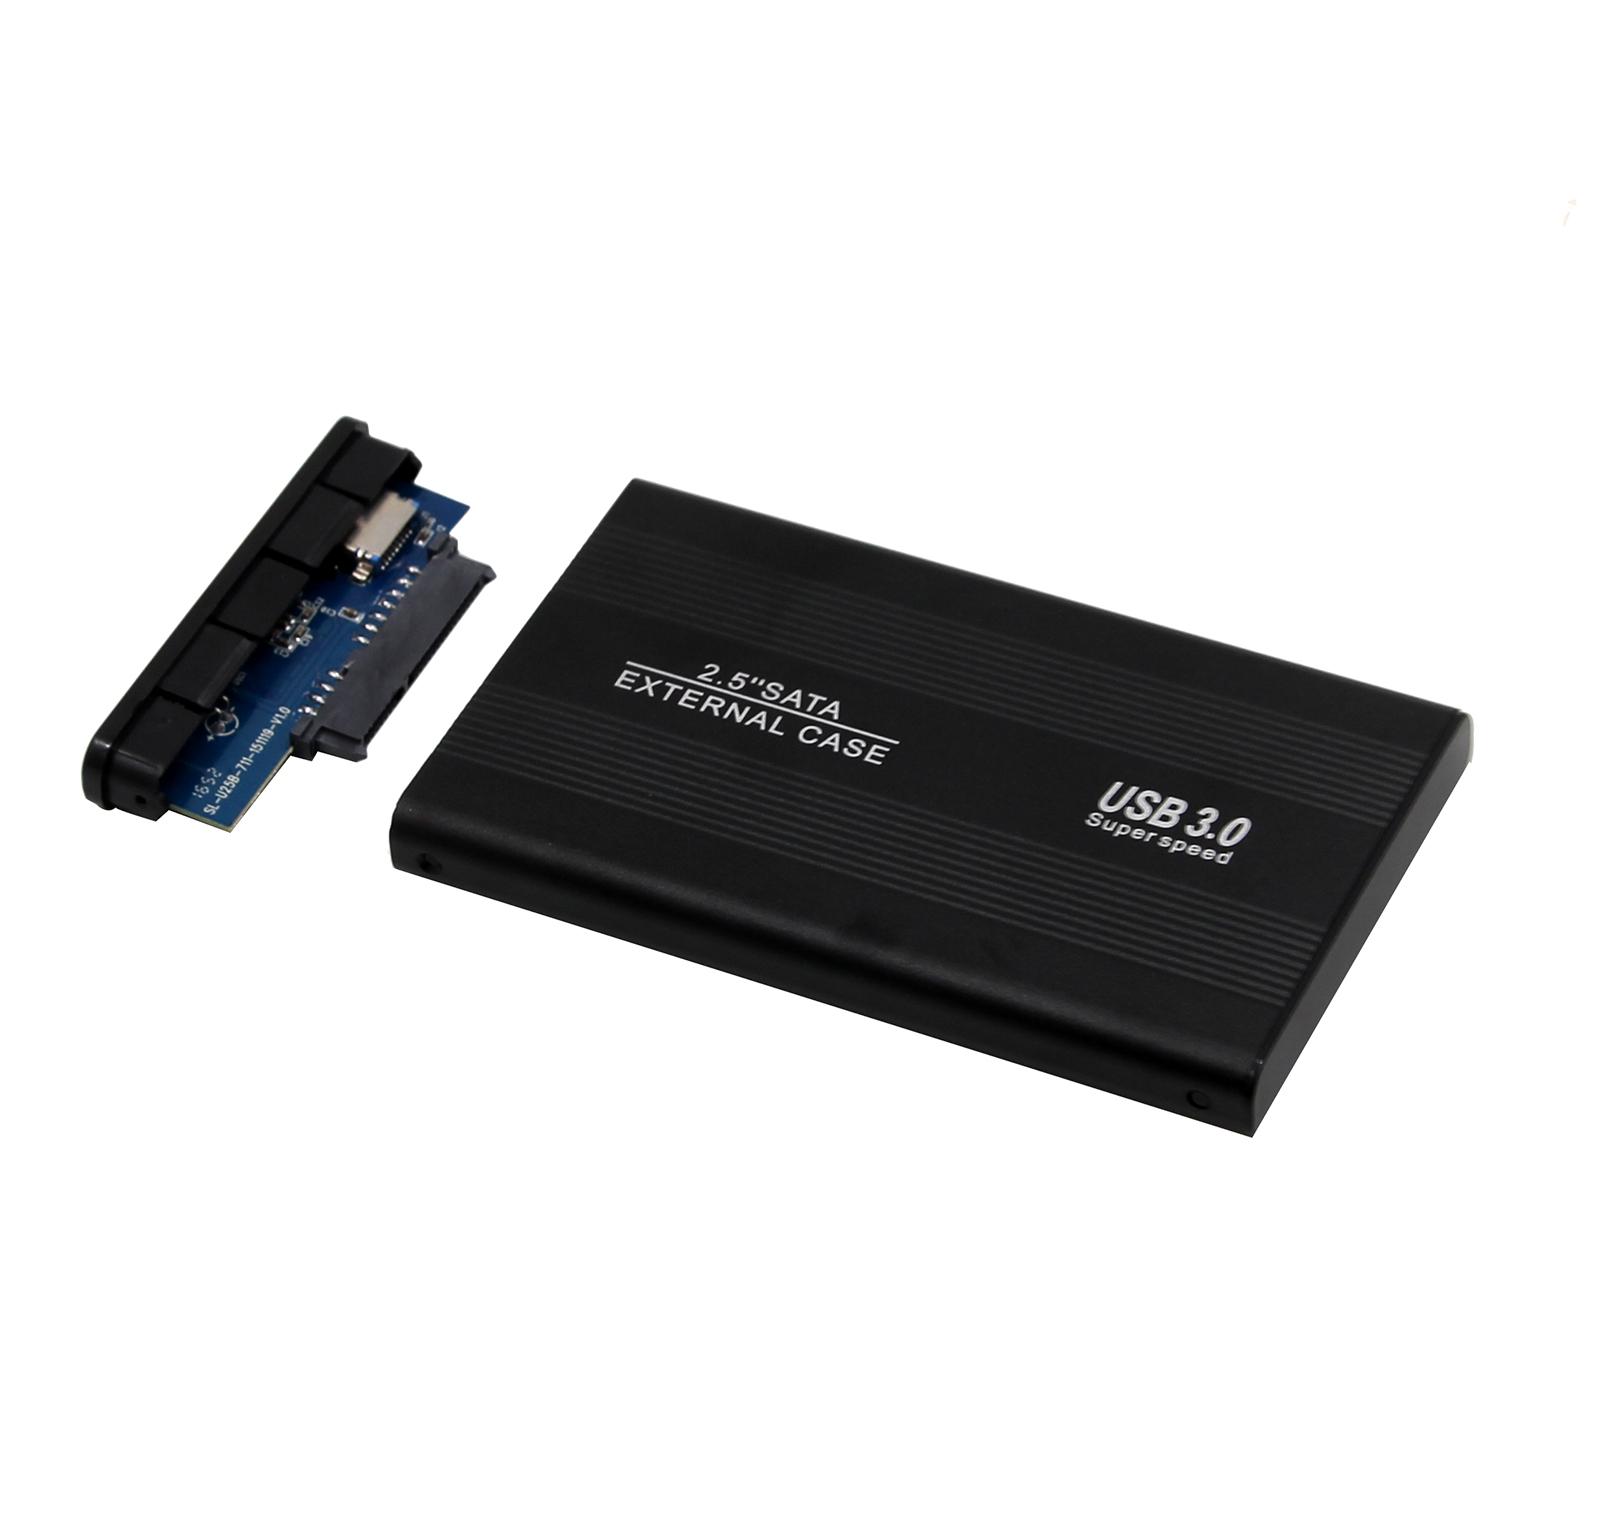 "60GB 120GB 160GB 2.5/"" SATA USB 3.0 Portable External Hard Drive HDD/&Case"